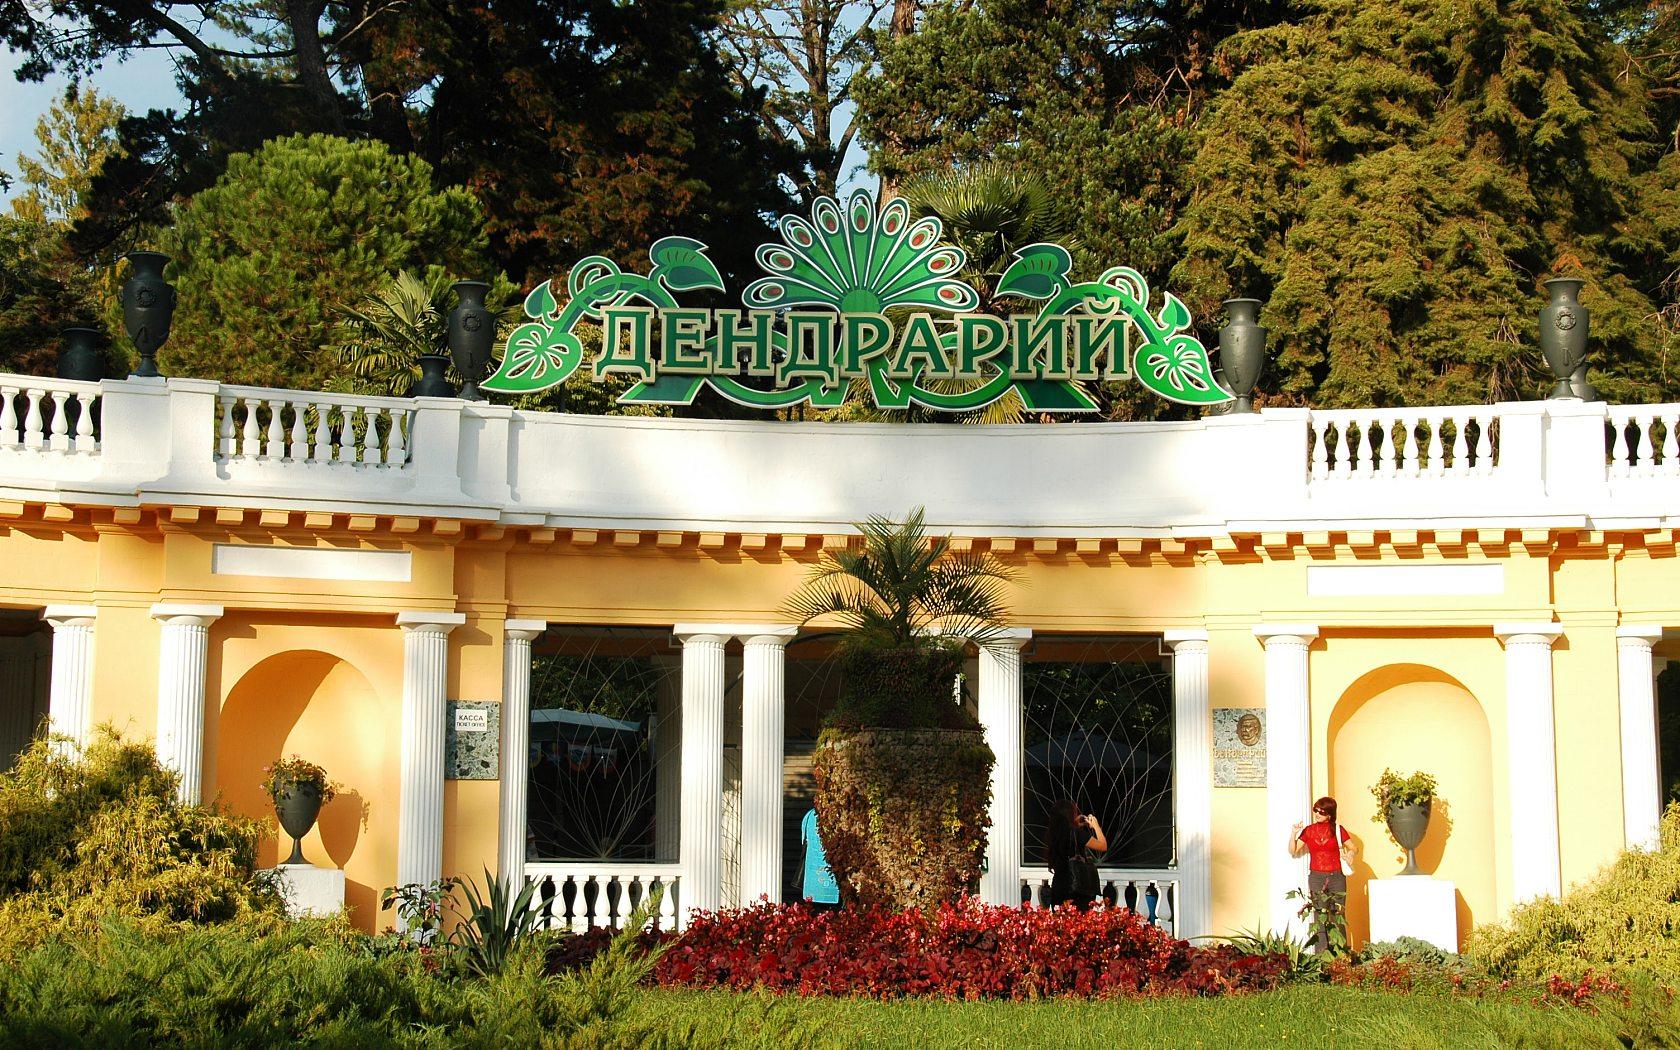 Dendrary Botanical Garden